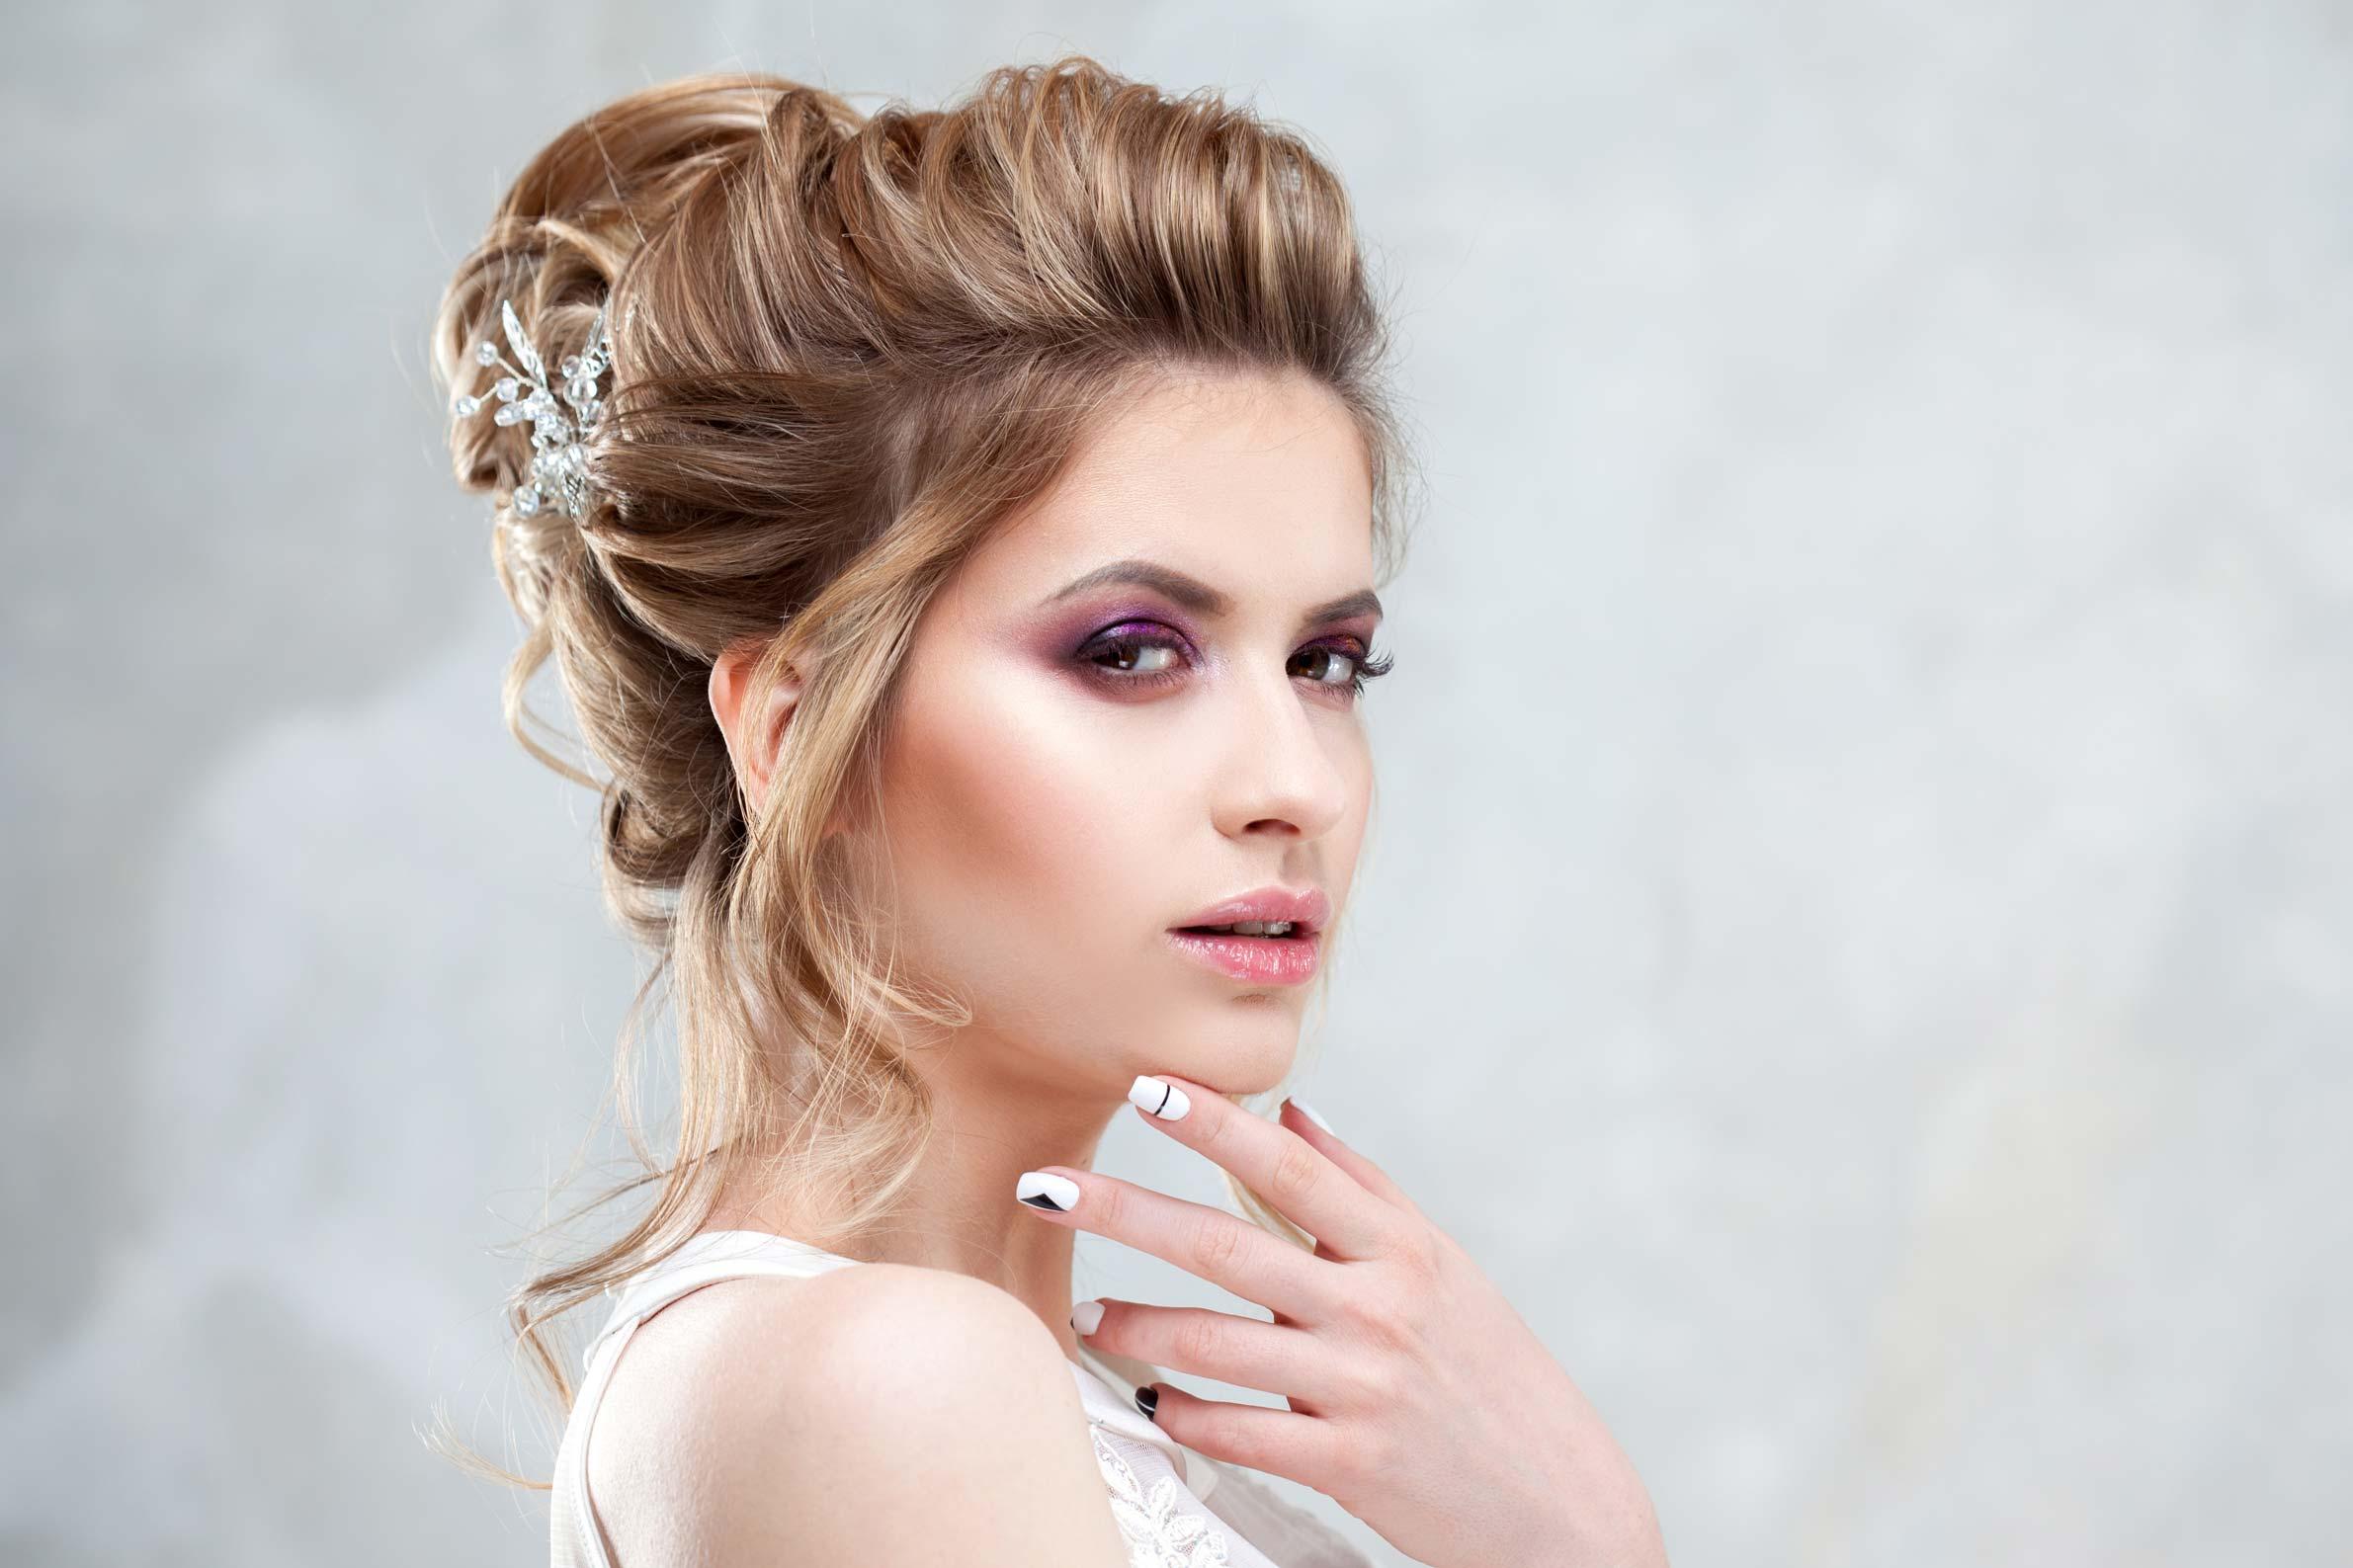 Wedding hair bride with wedding updo